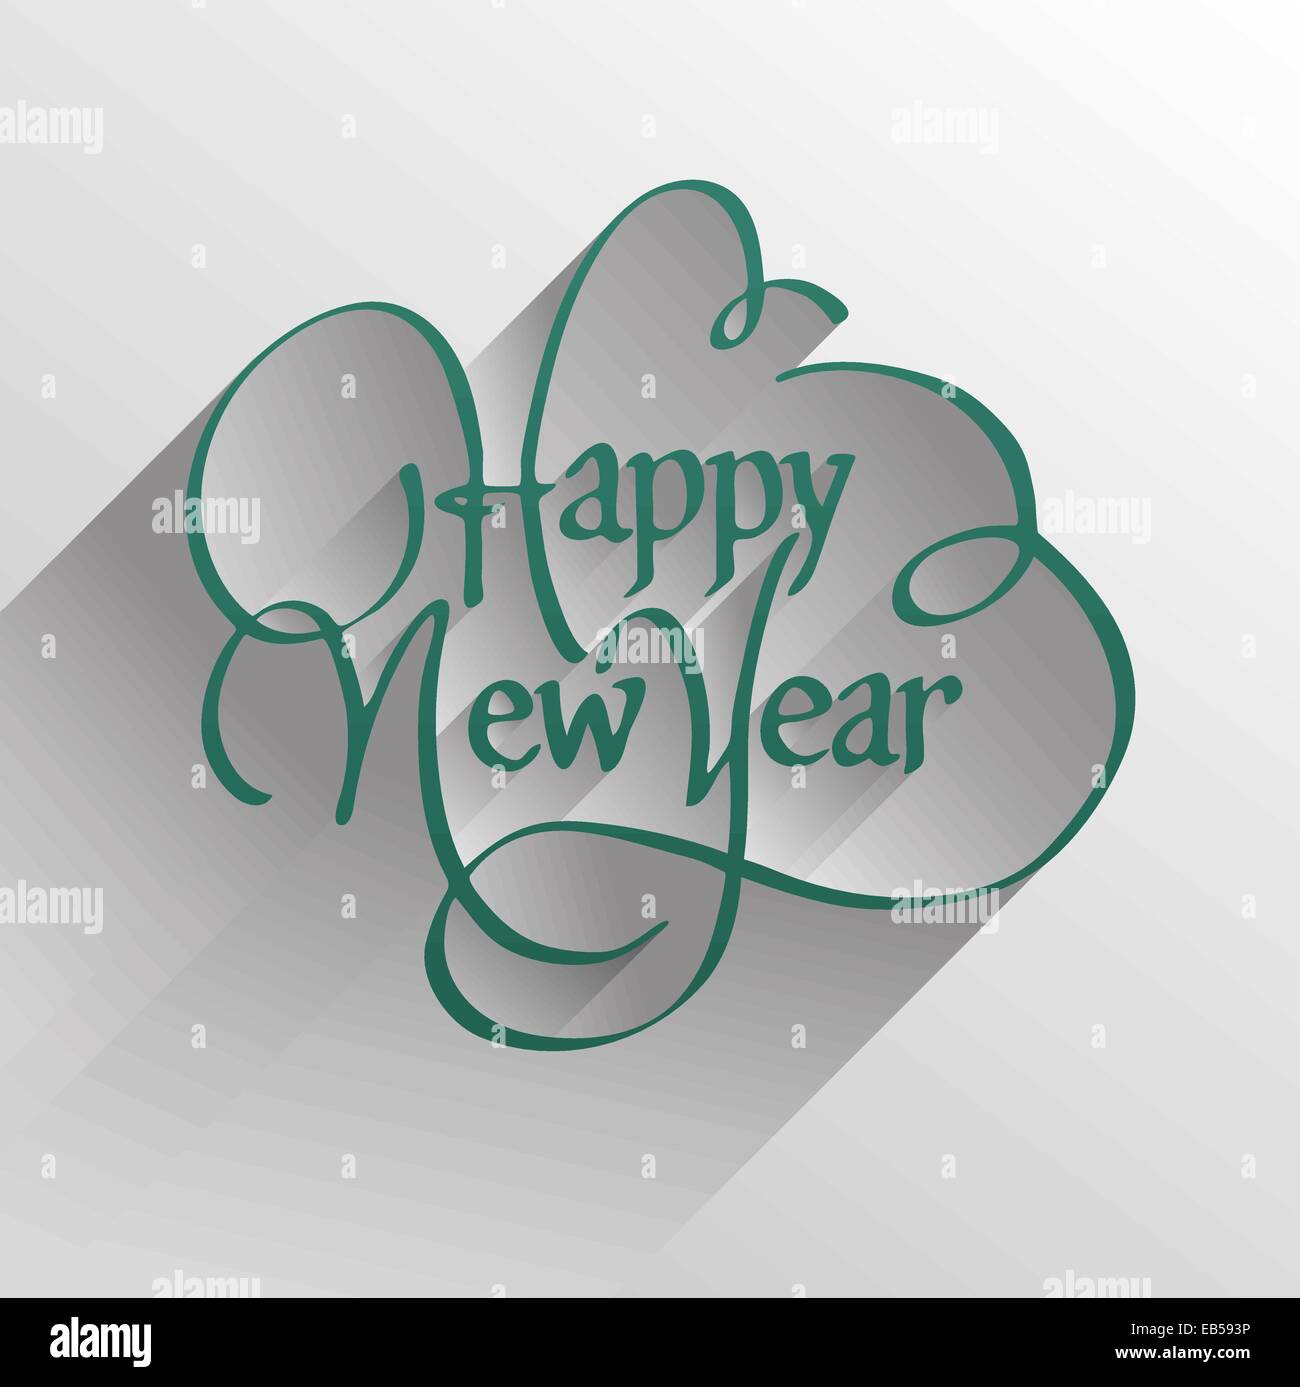 Year new happy stylish photo photos